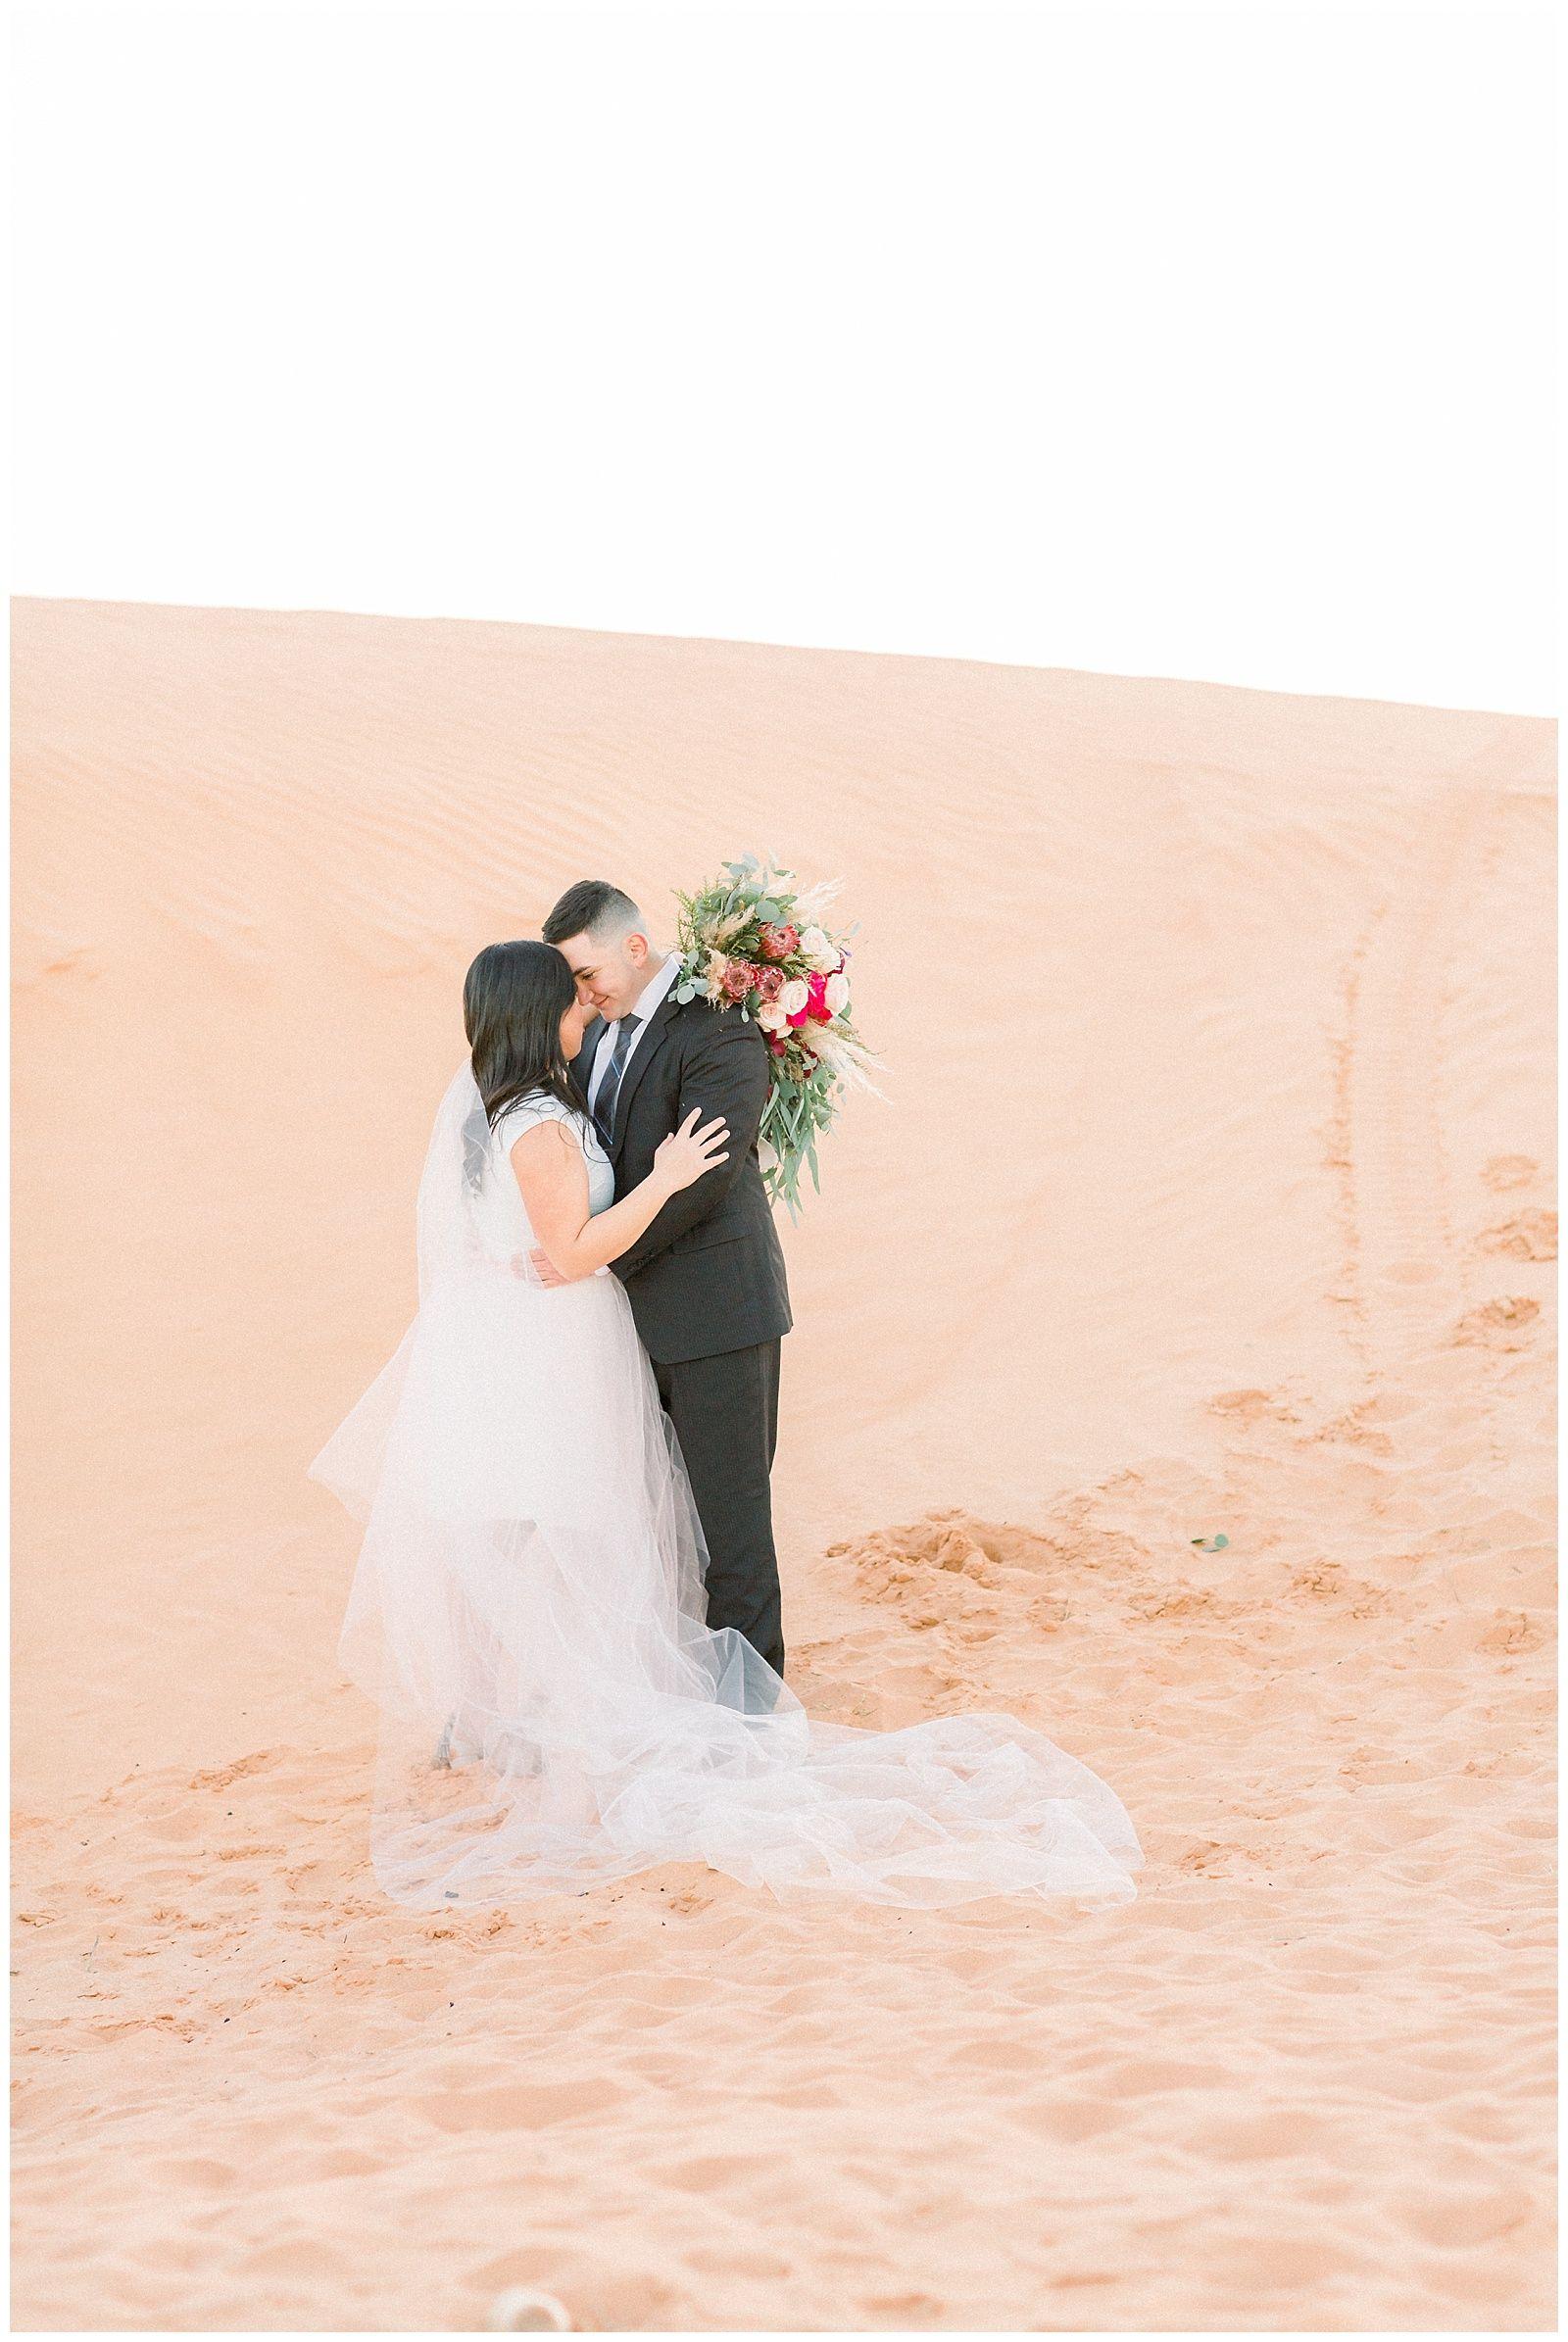 Red Sands El Paso Tx Yasmin Jered Jaz Theo Austin Wedding Photographer San Antonio Weddings Austin Wedding